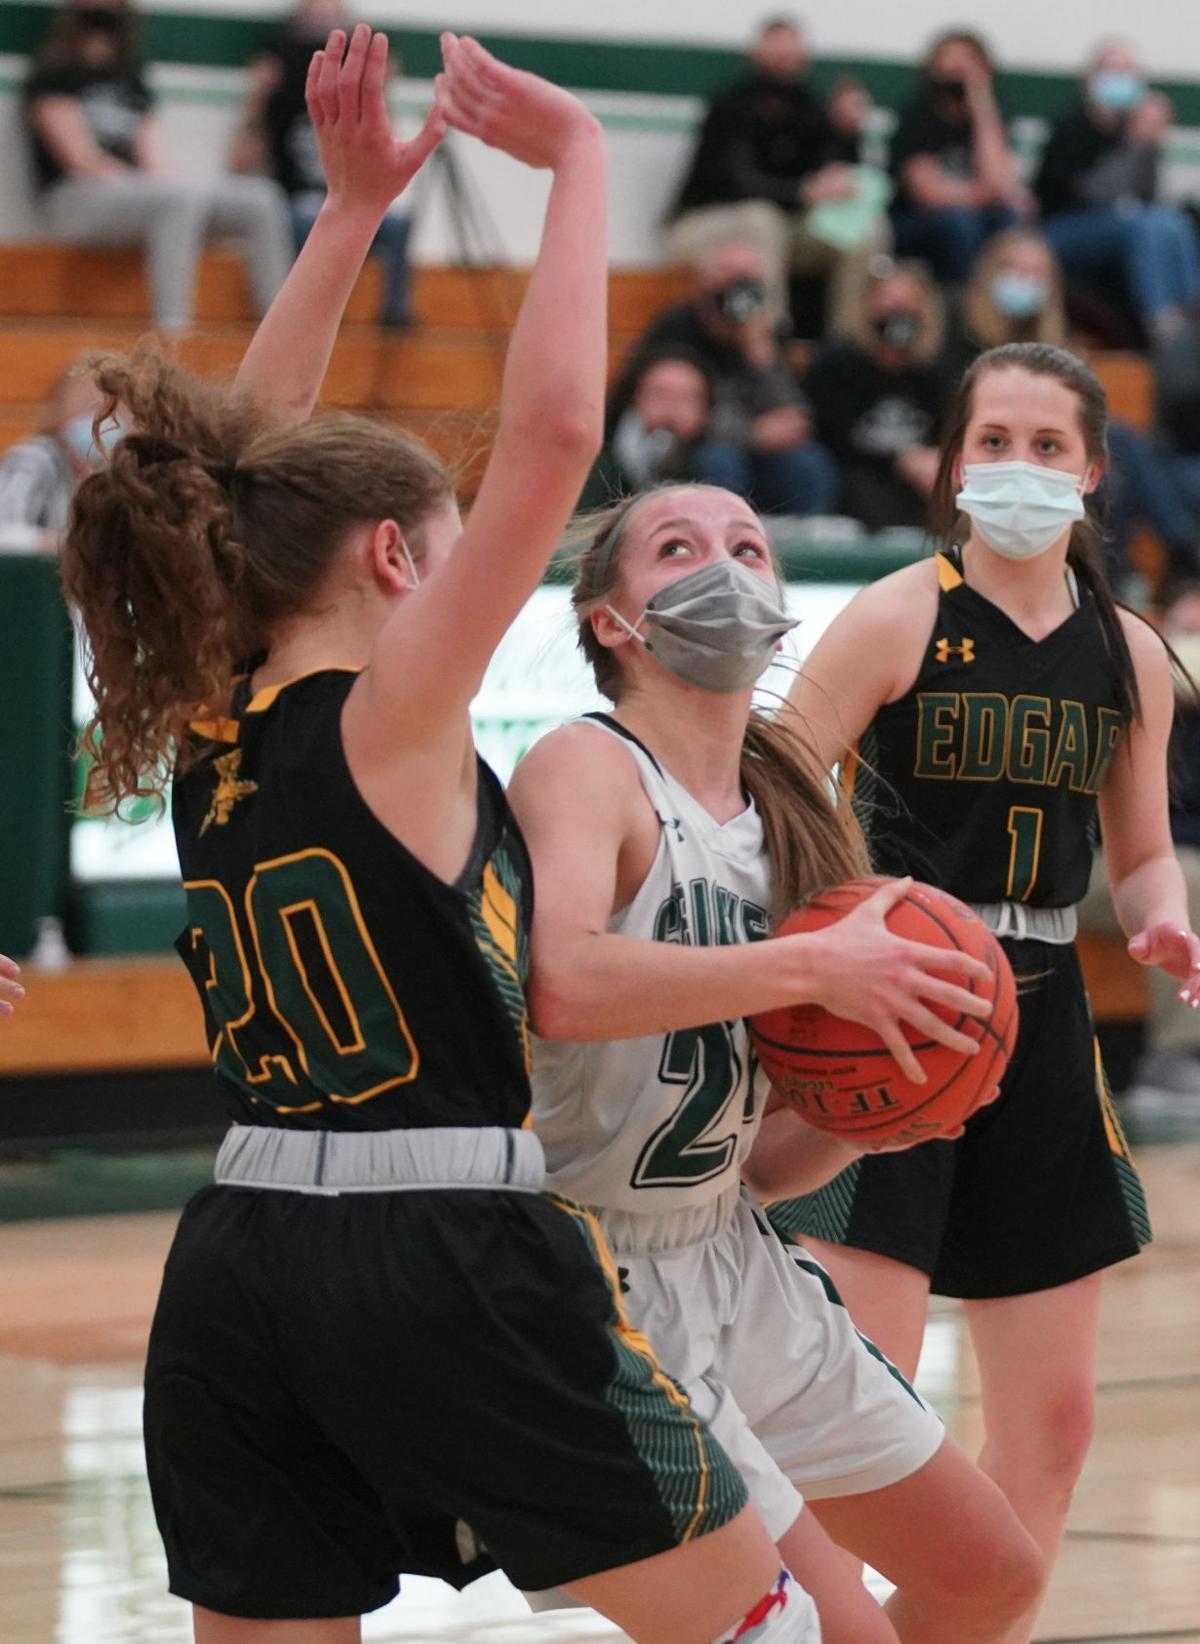 Edgar at Fall Creek girls basketball